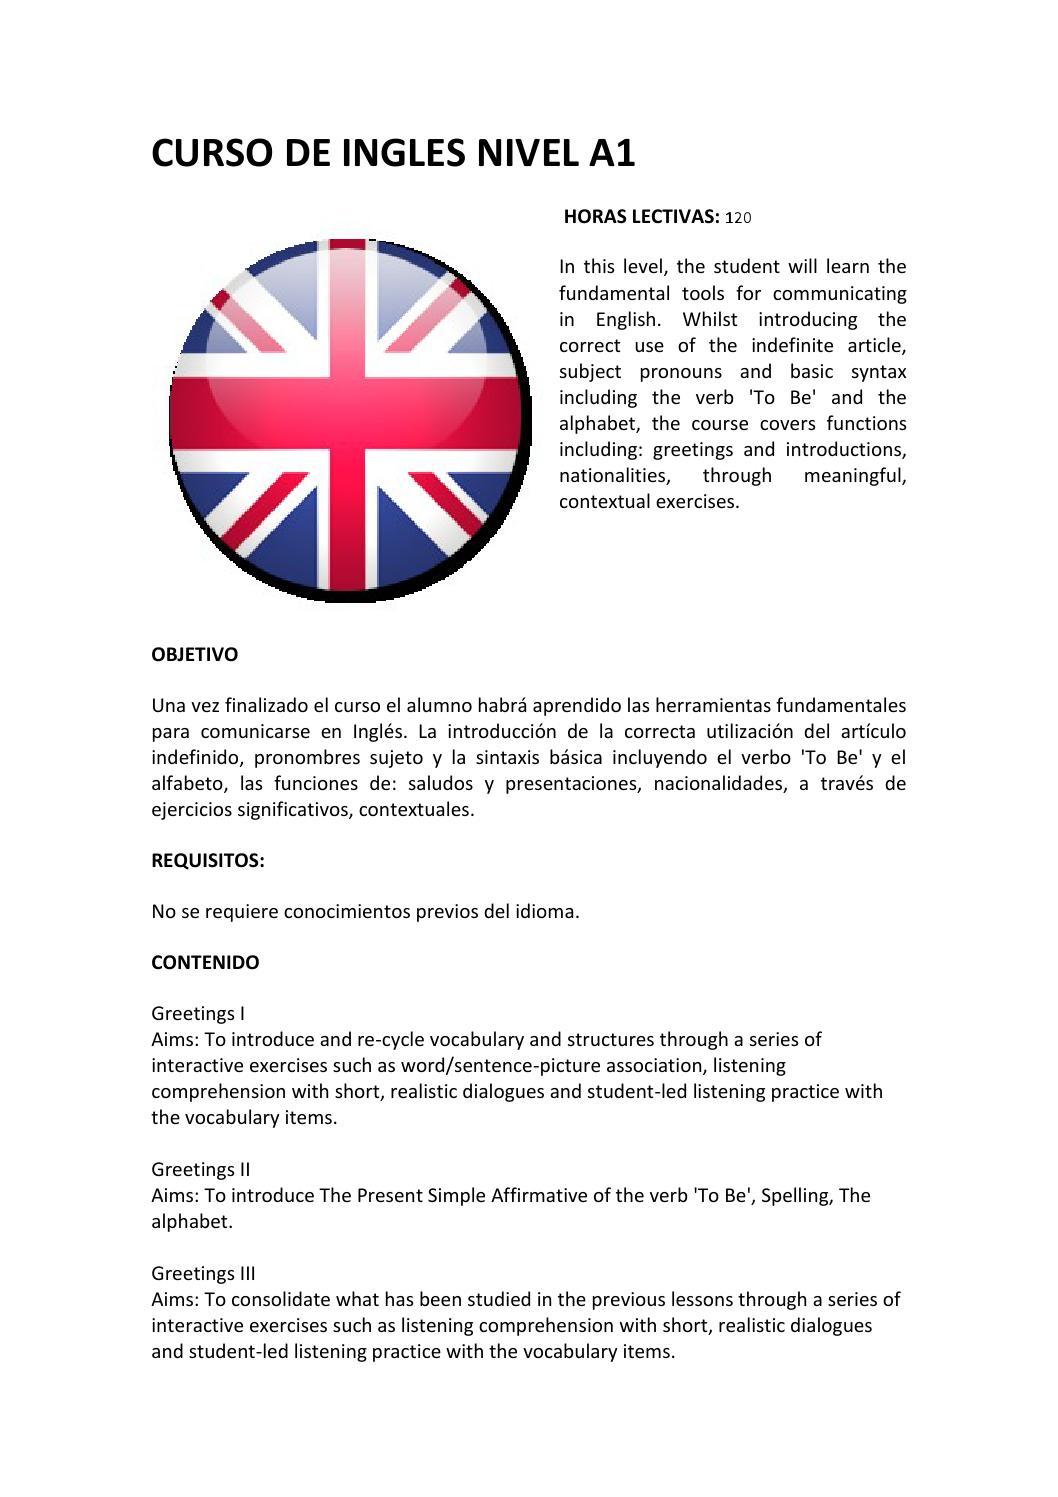 Curso De Ingles Nivel A1 By Actium Formacion Issuu